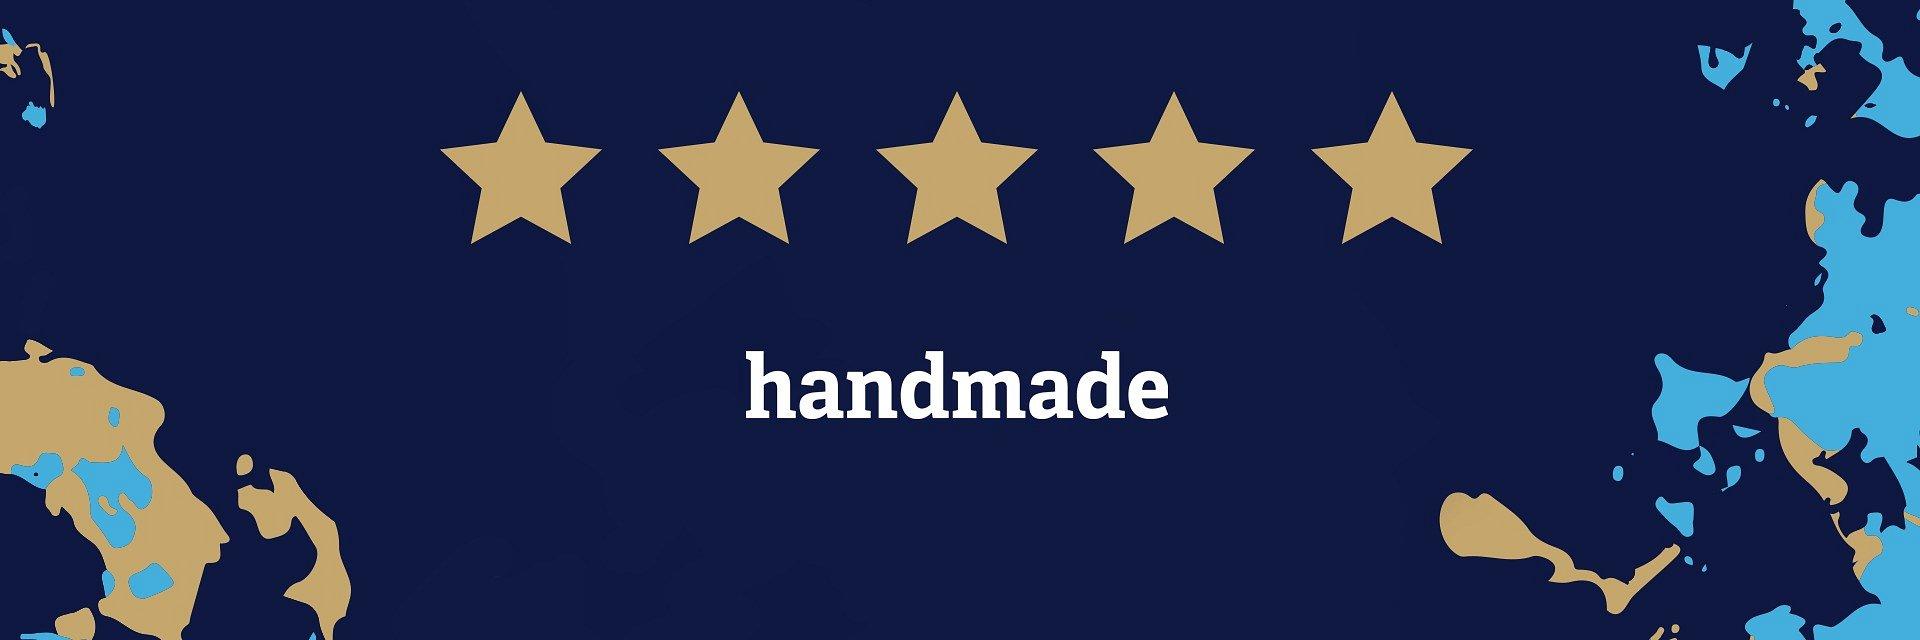 Hand Made - agencja reklamowa na 5!